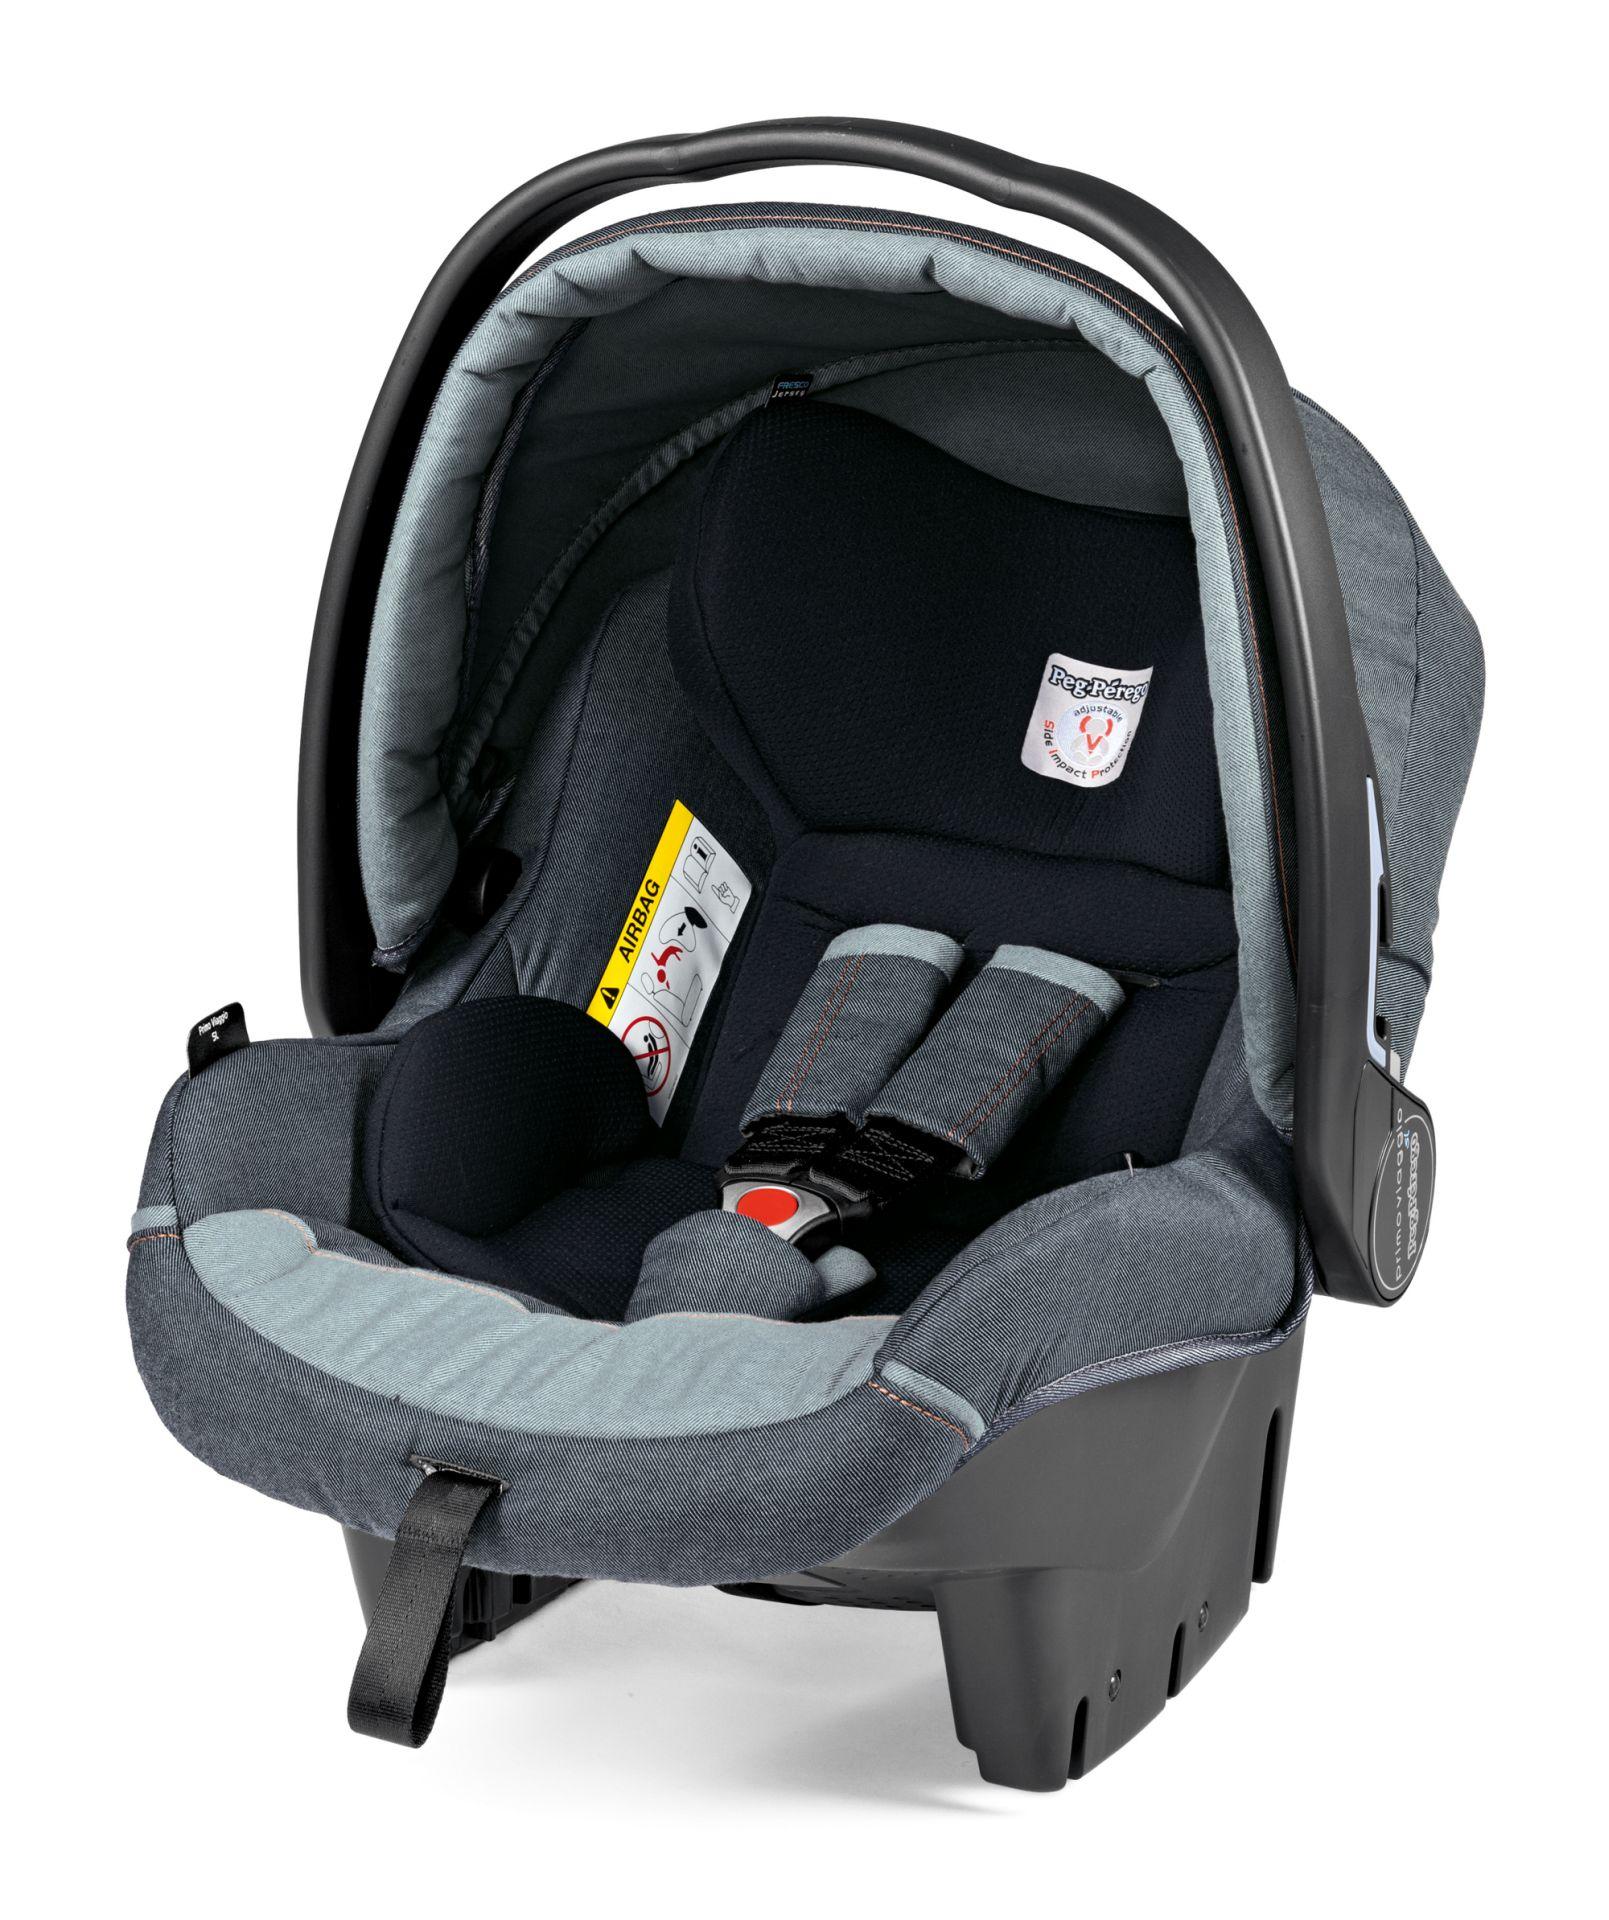 Peg-Perego Infant Car Seat Primo Viaggio SL 2017 Blue Denim - Buy at ...